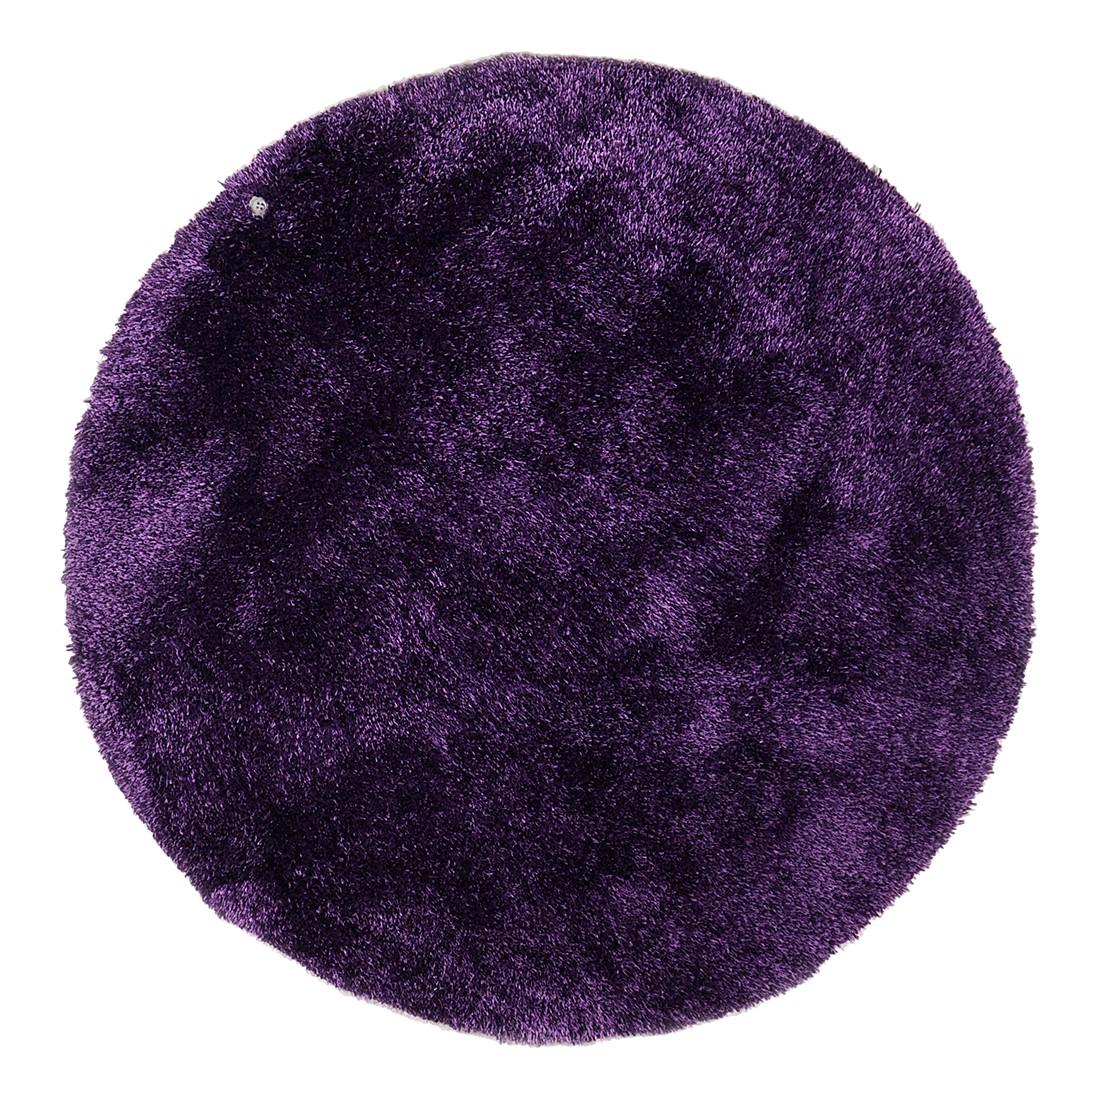 Image of Tappeto Soft Round - Viola - Dimensioni: 140 x 140 cm, Tom Tailor